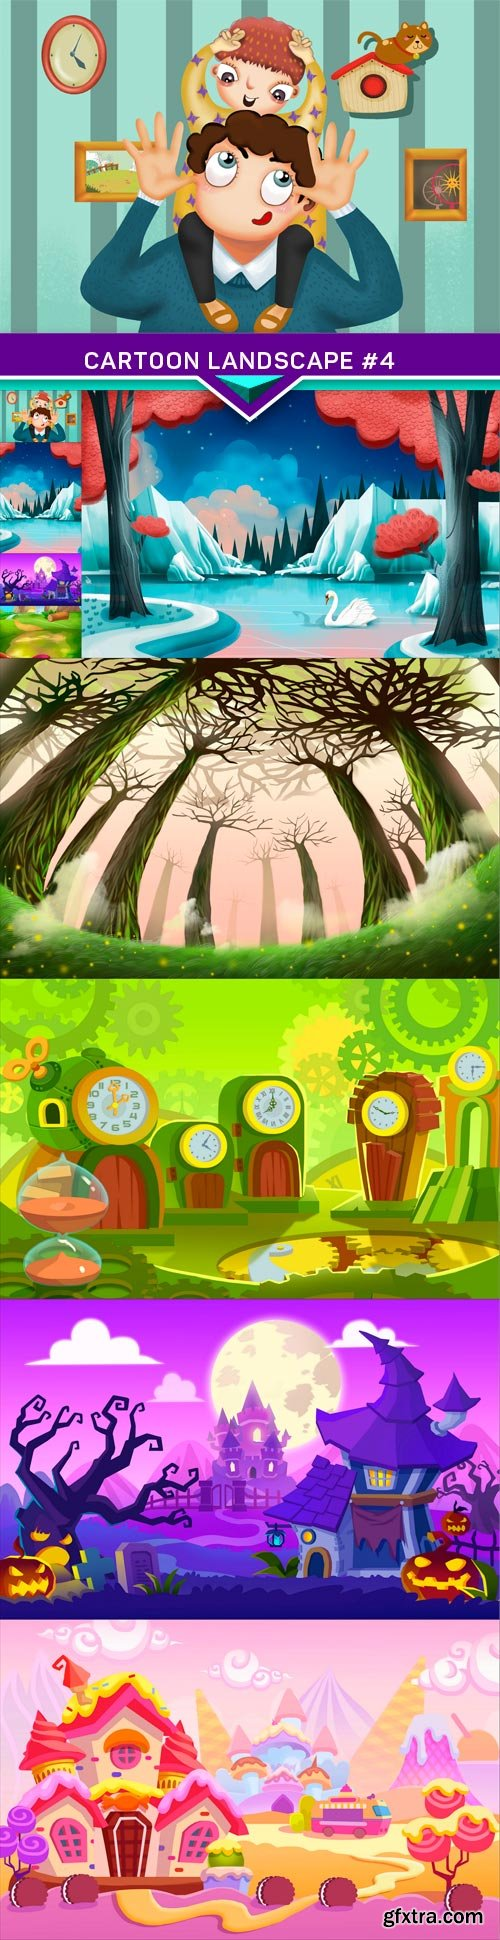 Cartoon landscape #4 9x JPEG